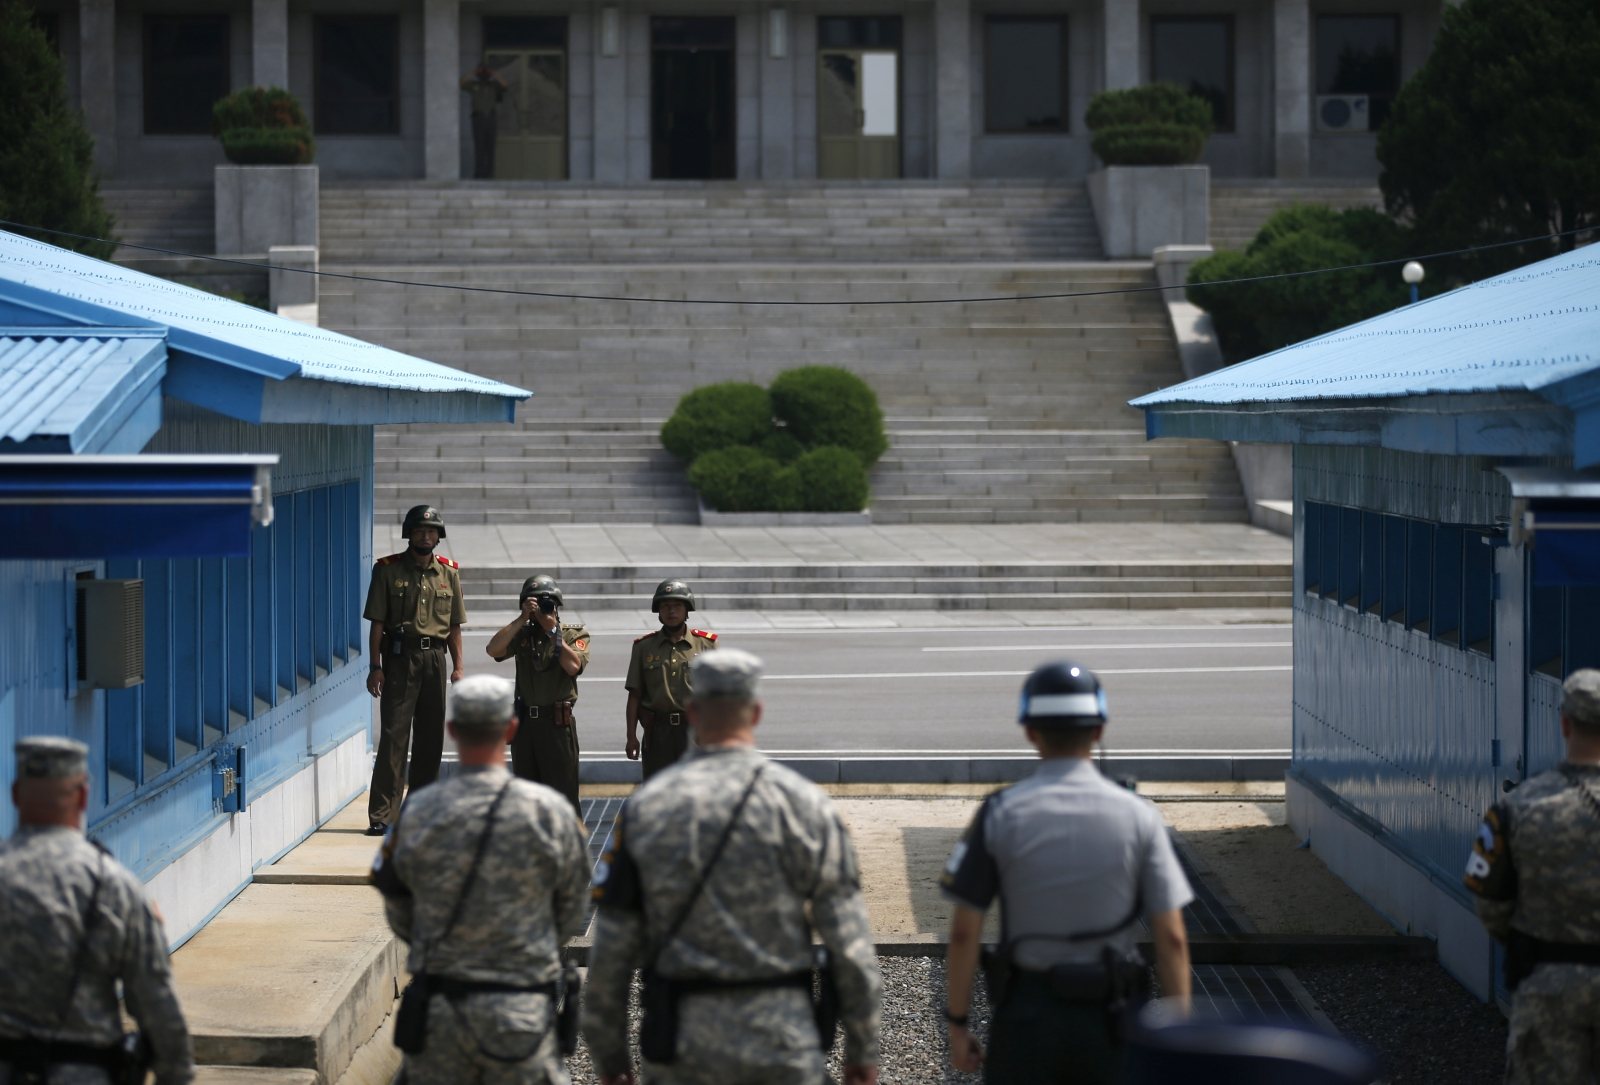 North Korea and South Korea hold high-level military talks